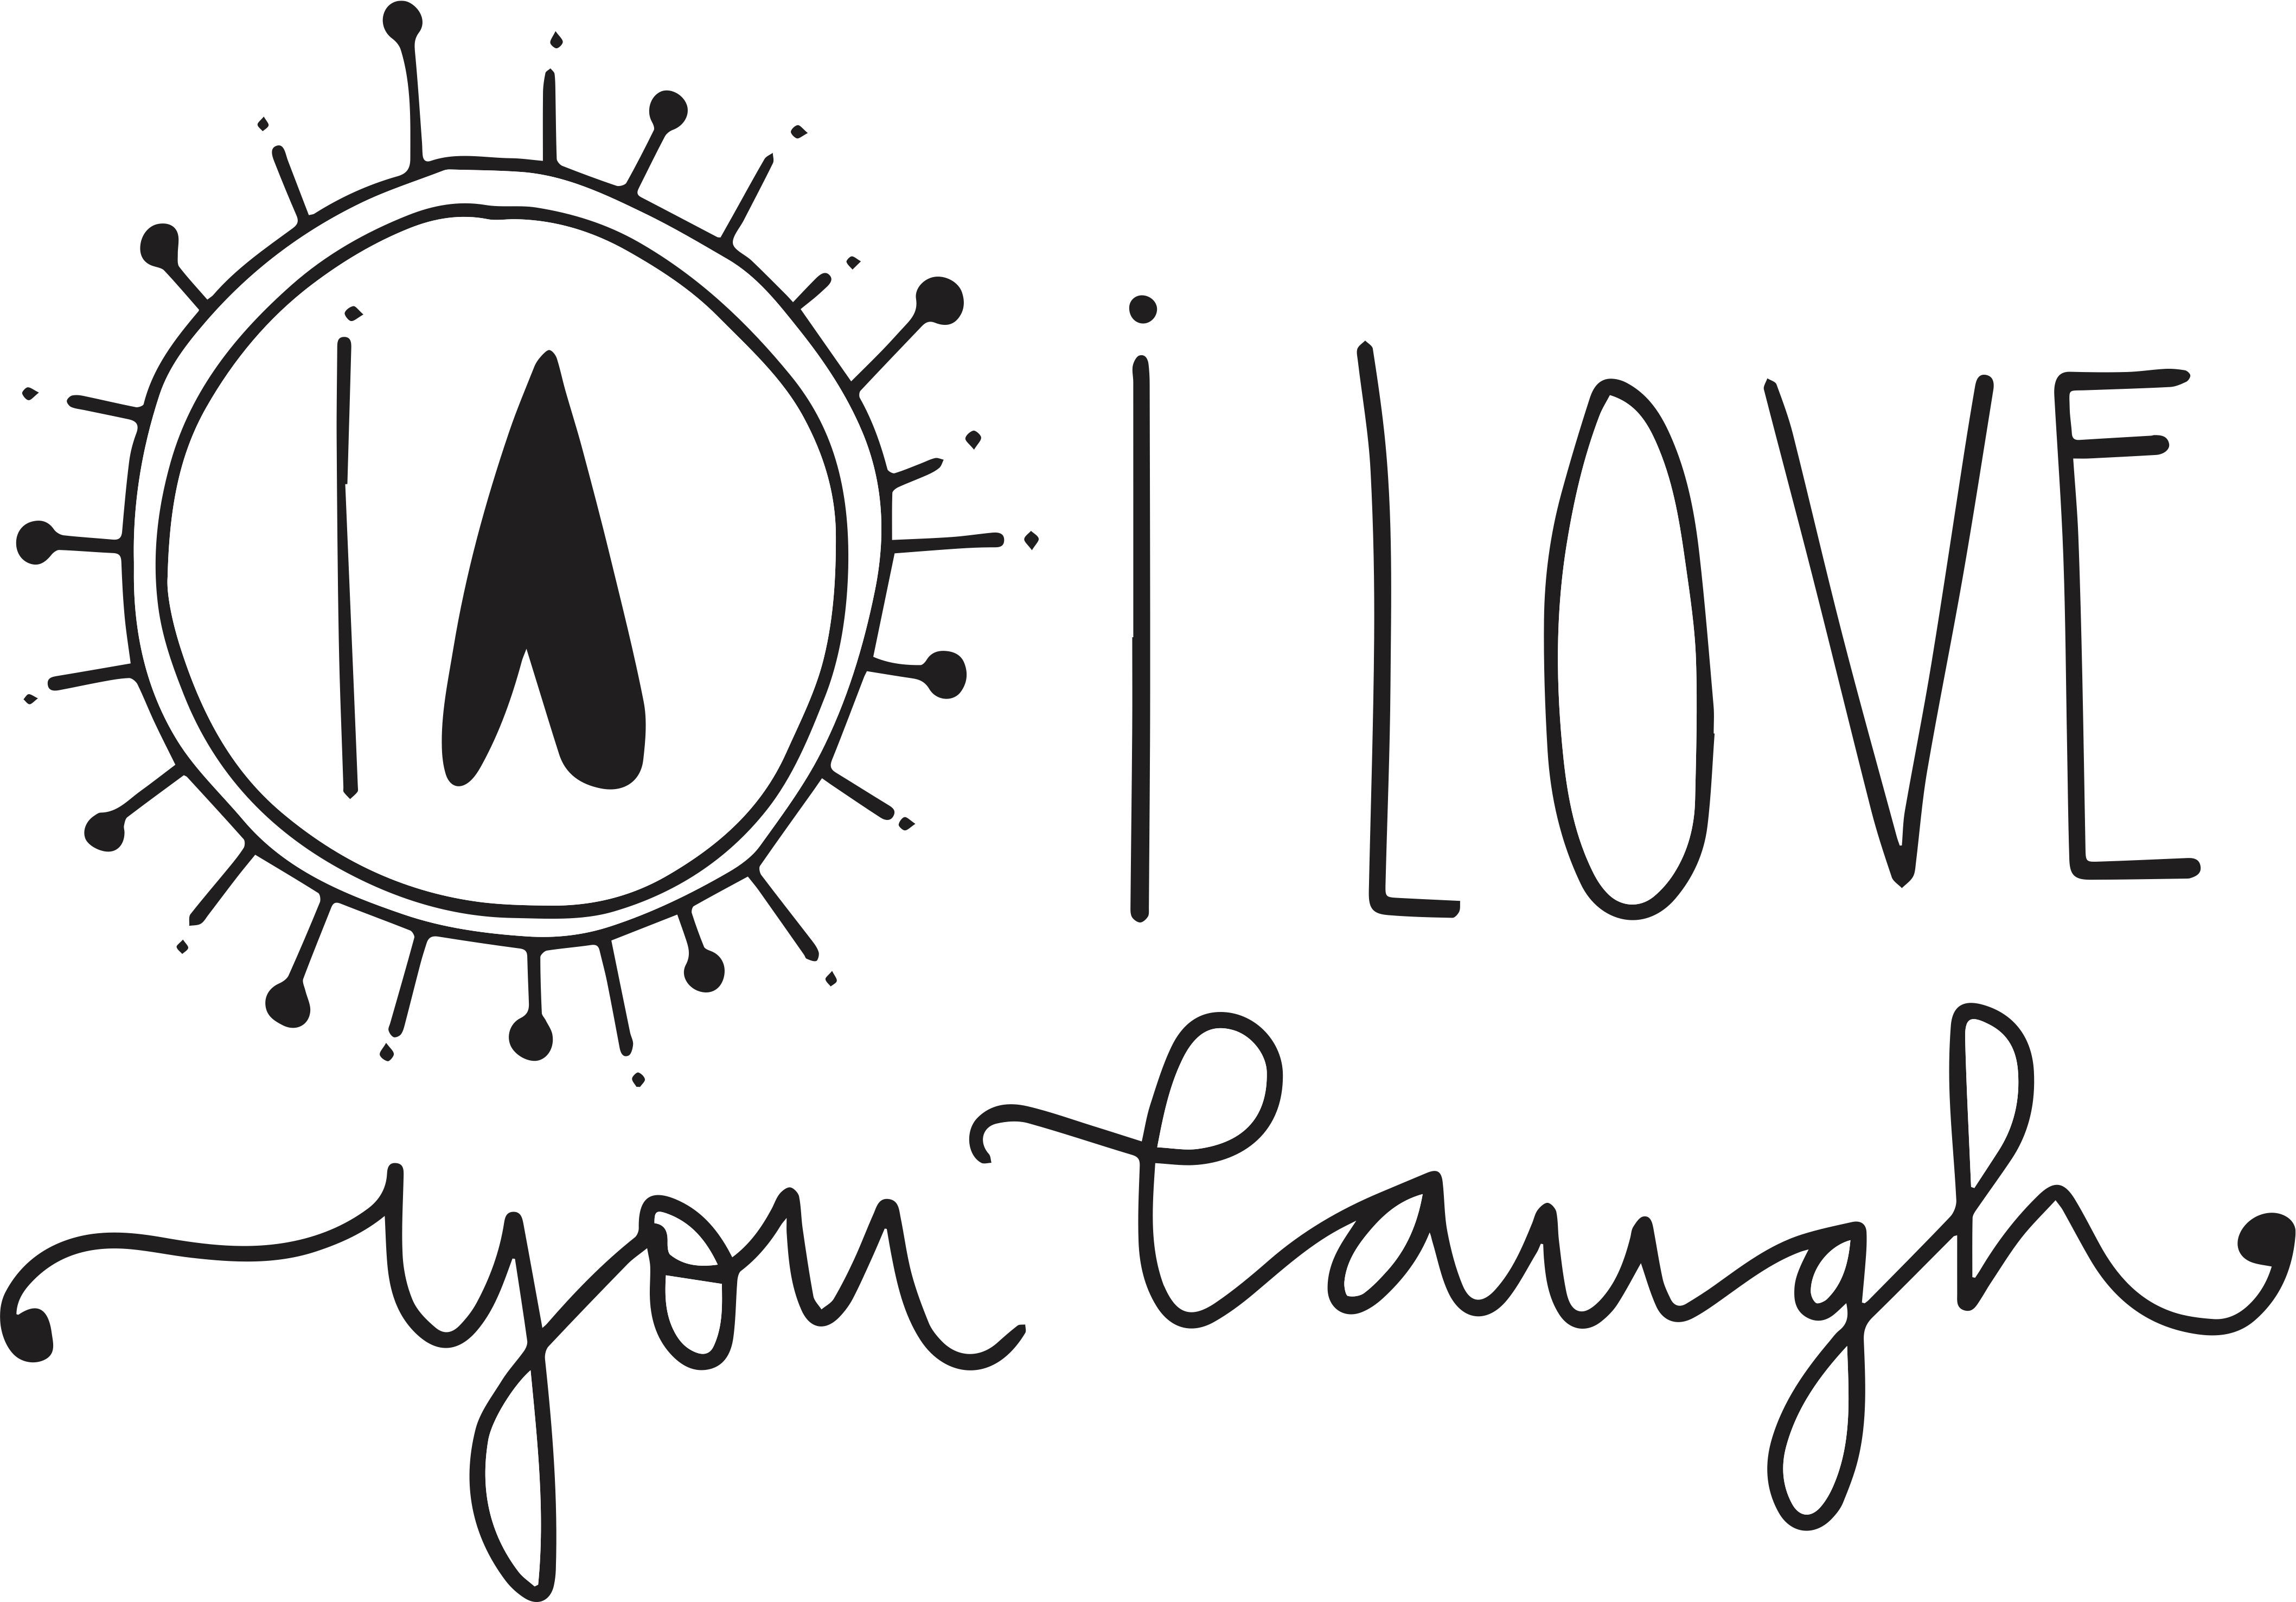 Iloveyoulaugh